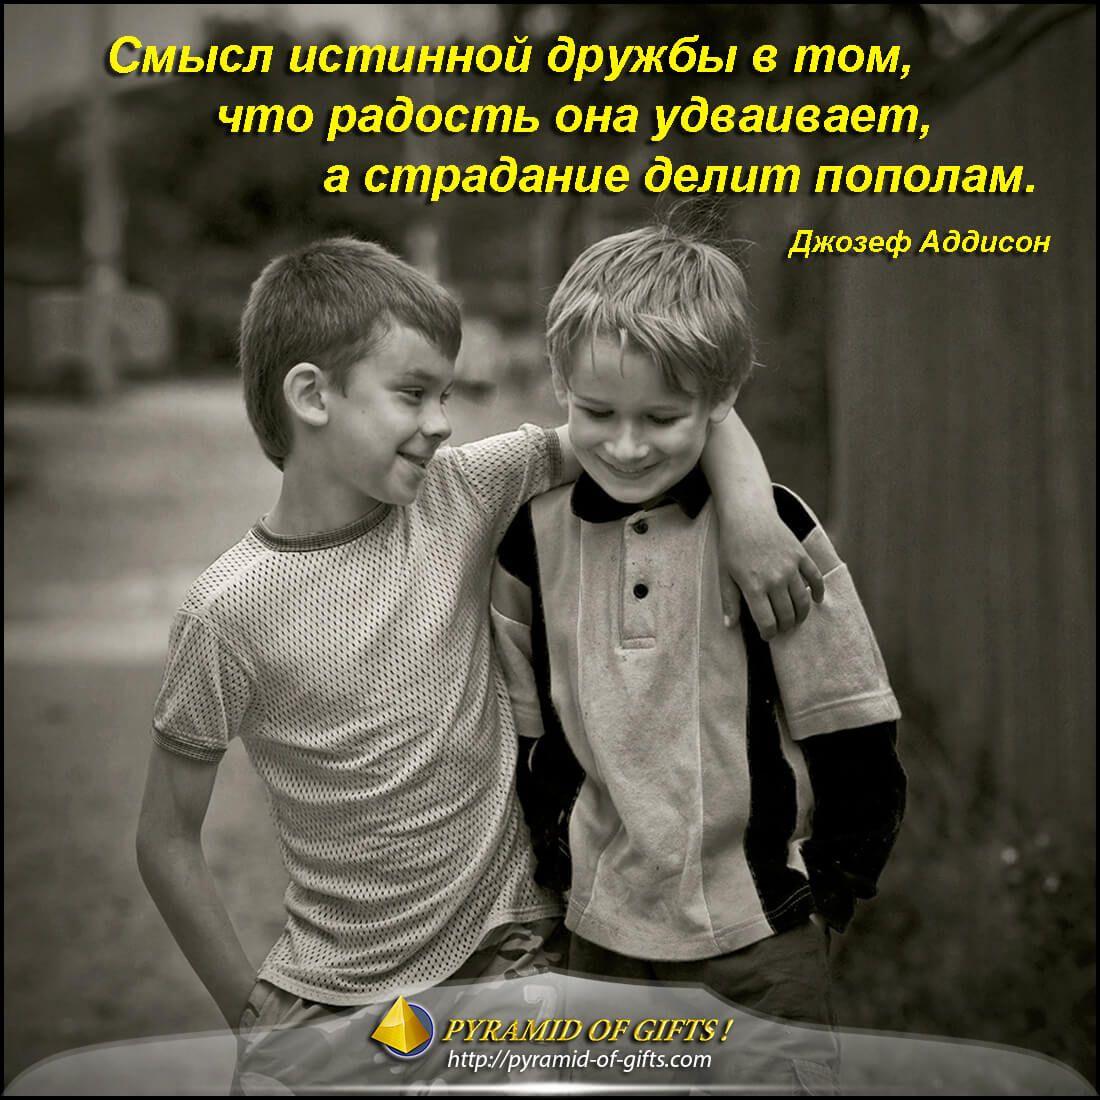 Афоризмы и фото про дружбу